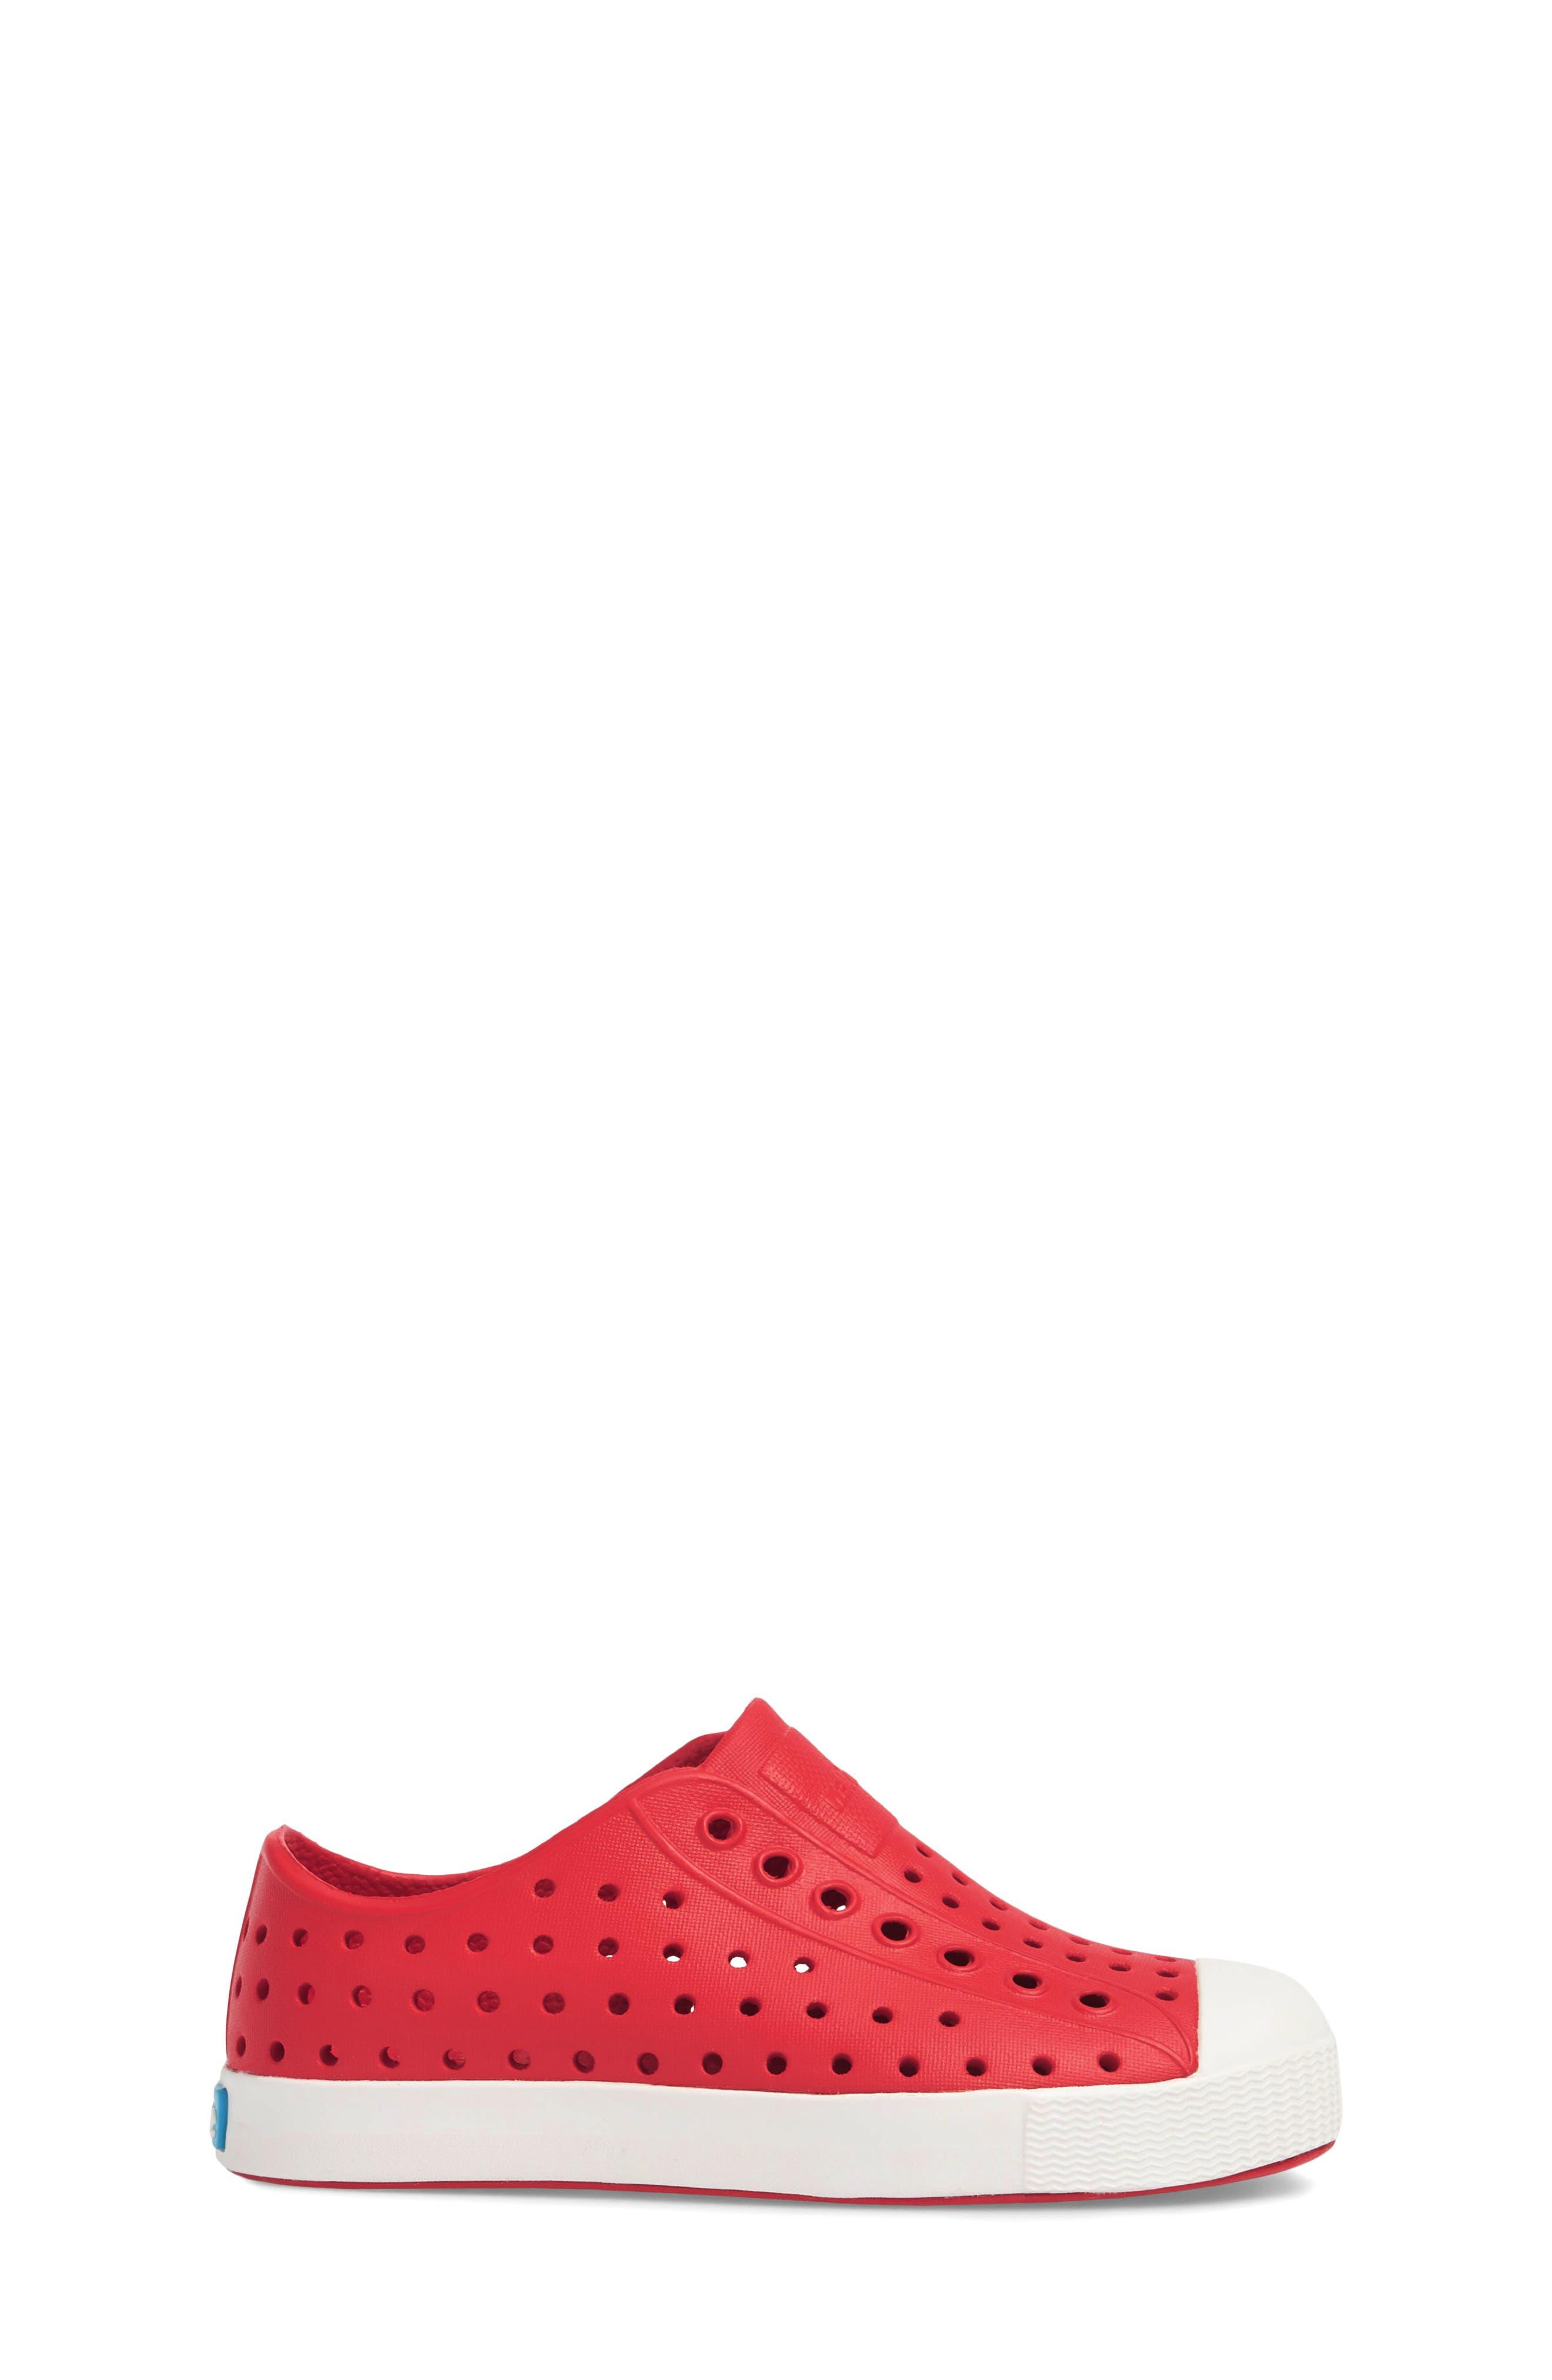 'Jefferson' Water Friendly Slip-On Sneaker,                             Alternate thumbnail 130, color,